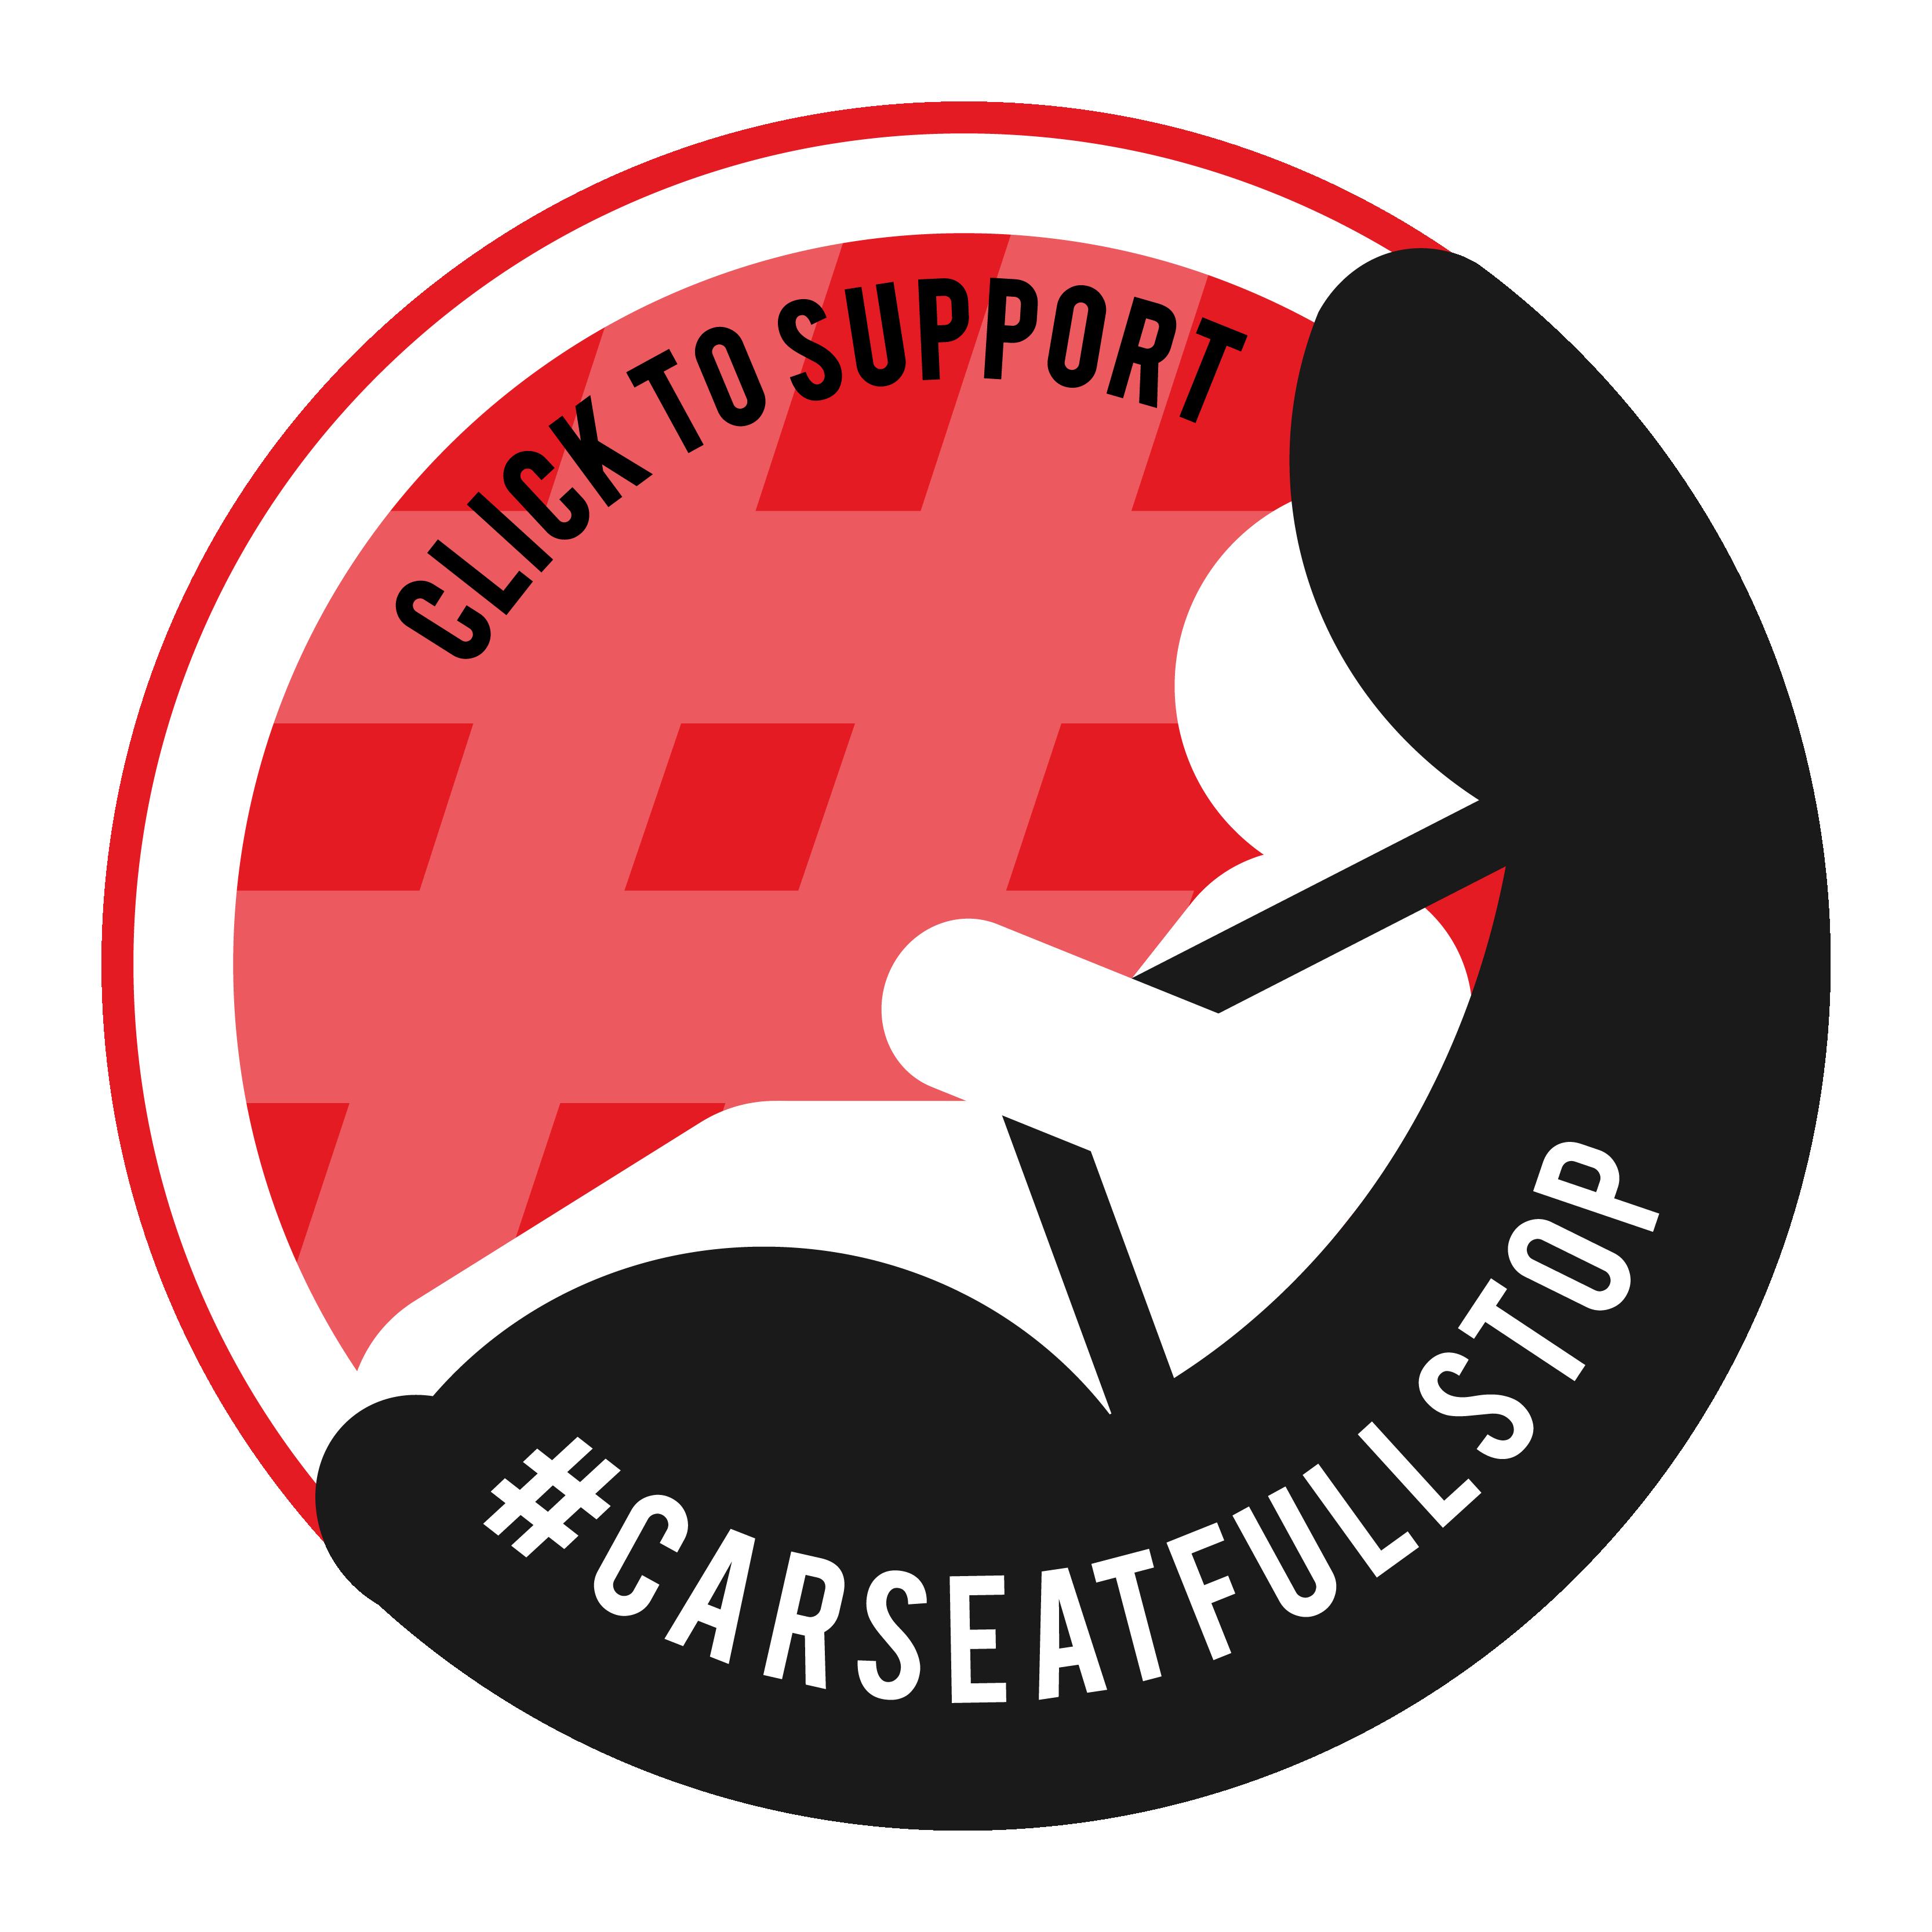 #CarseatFullstop|HarassedMom